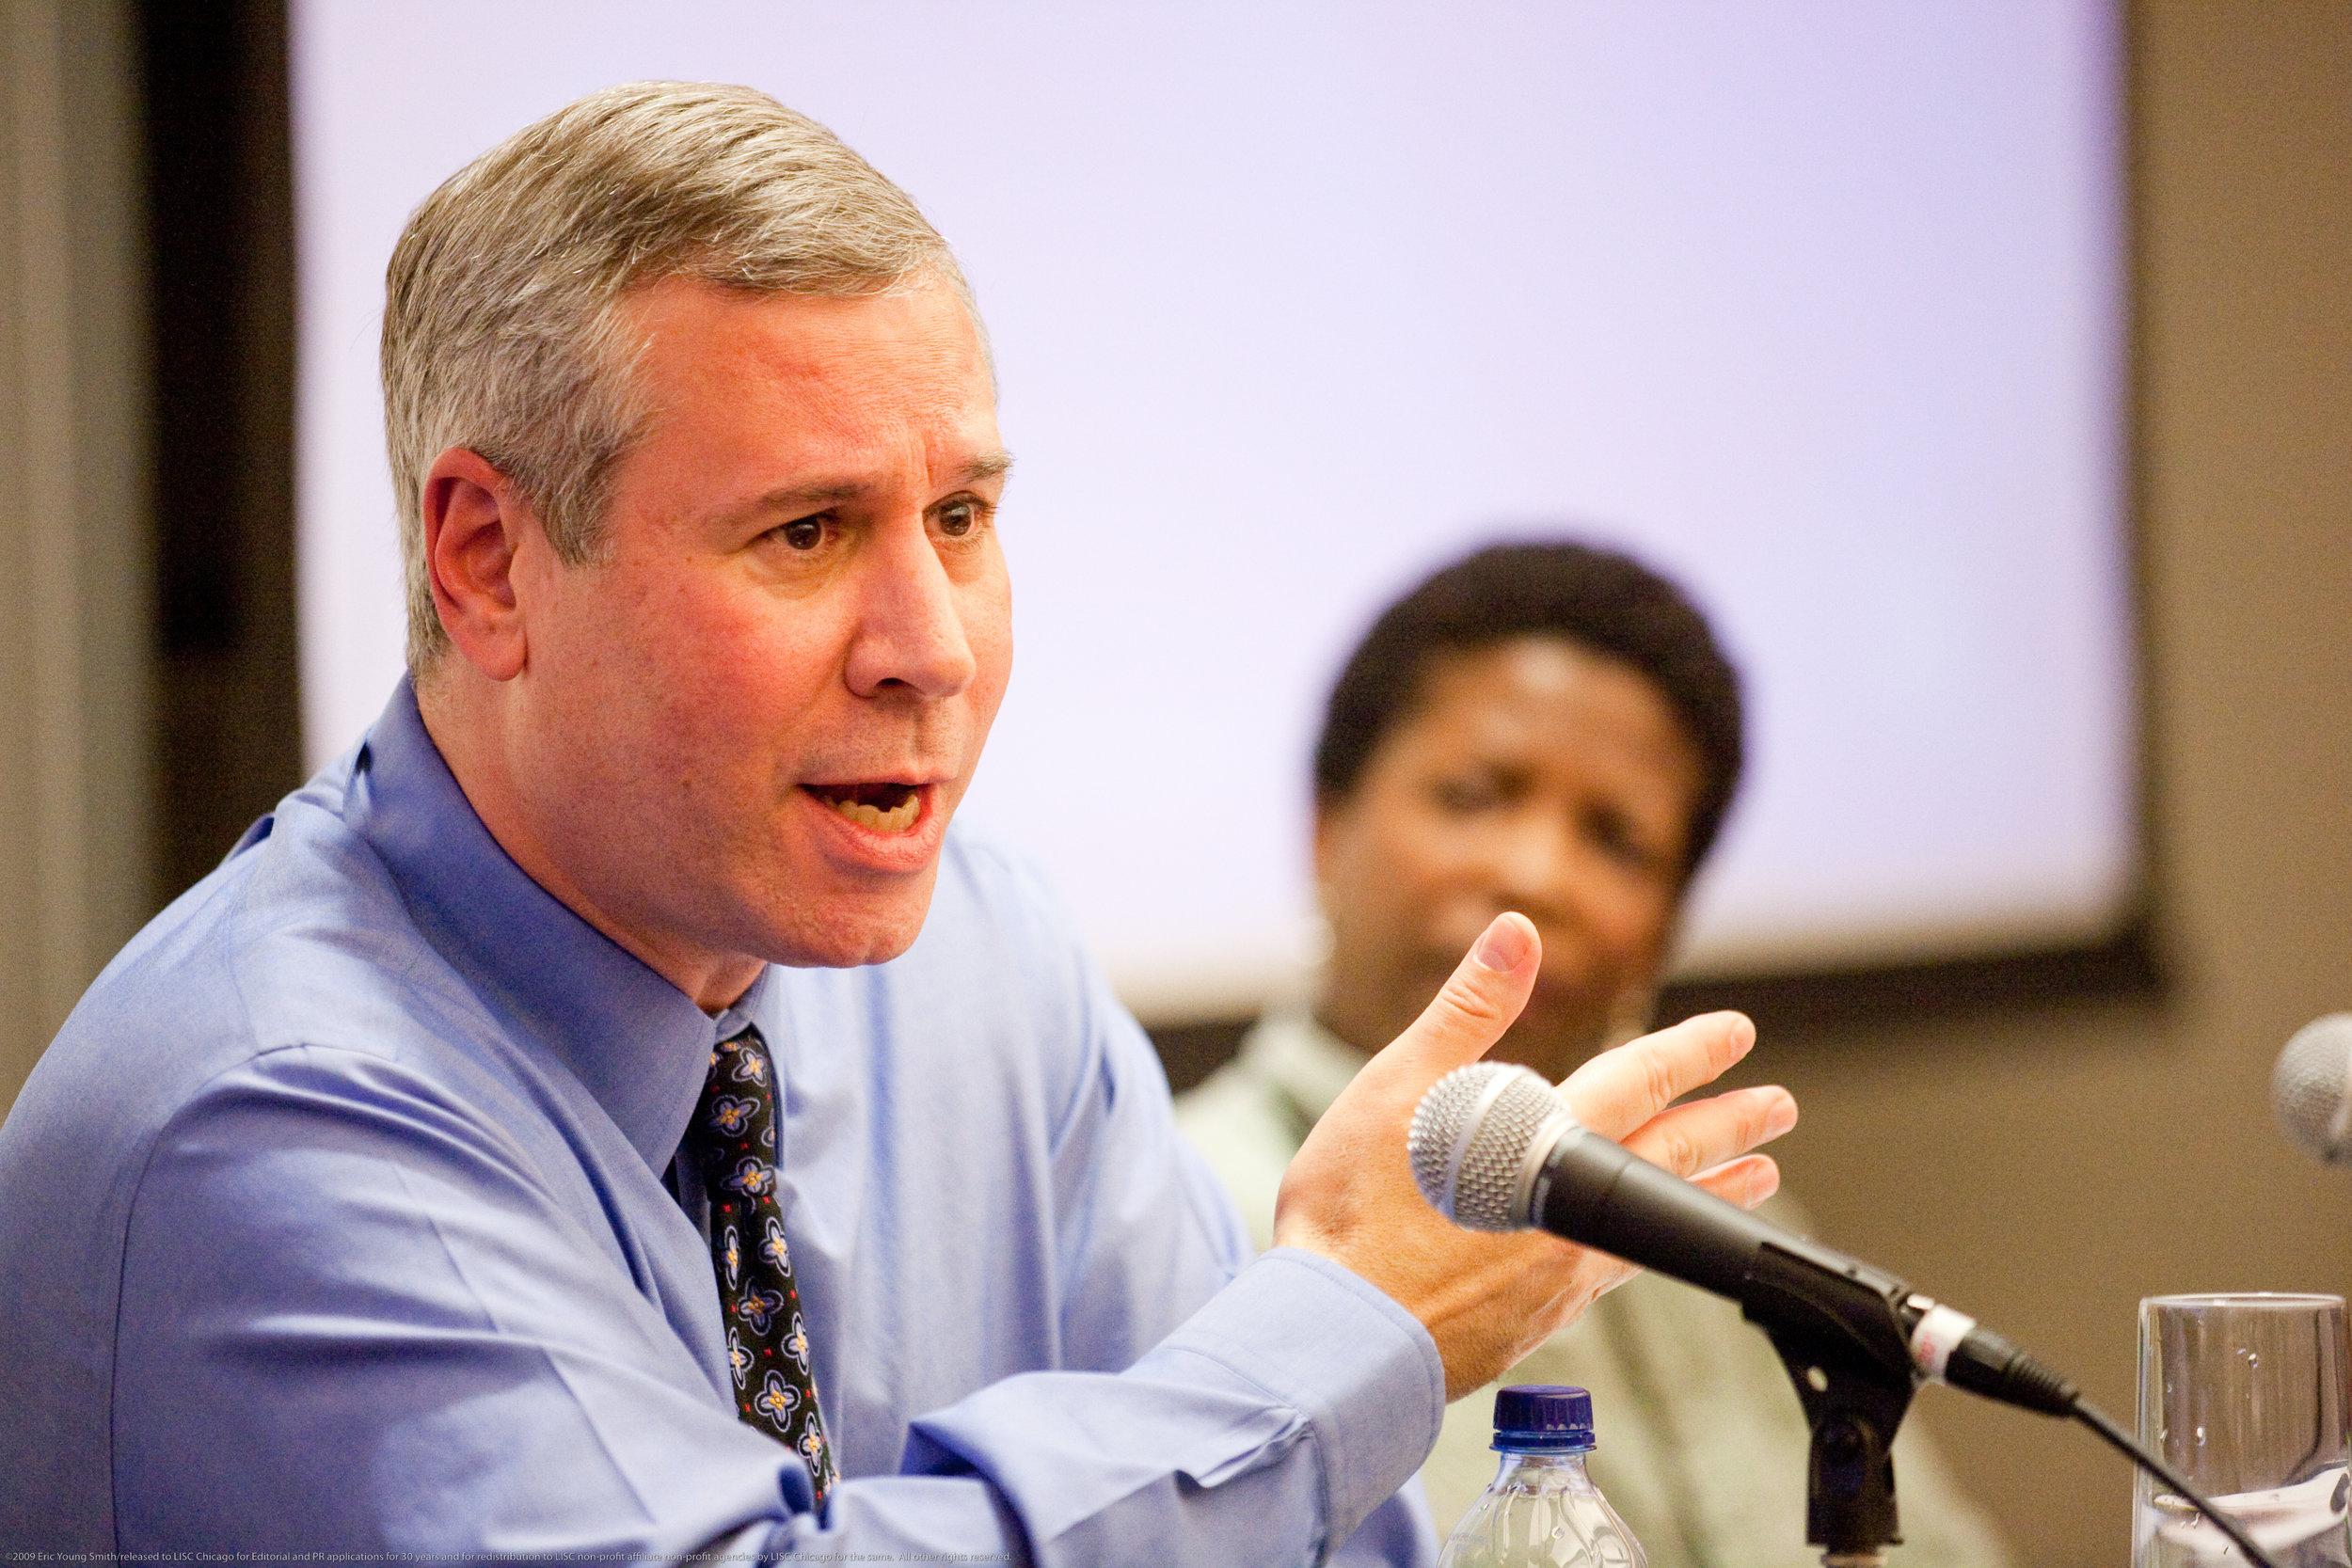 Joel Bookman provides consulting in community development